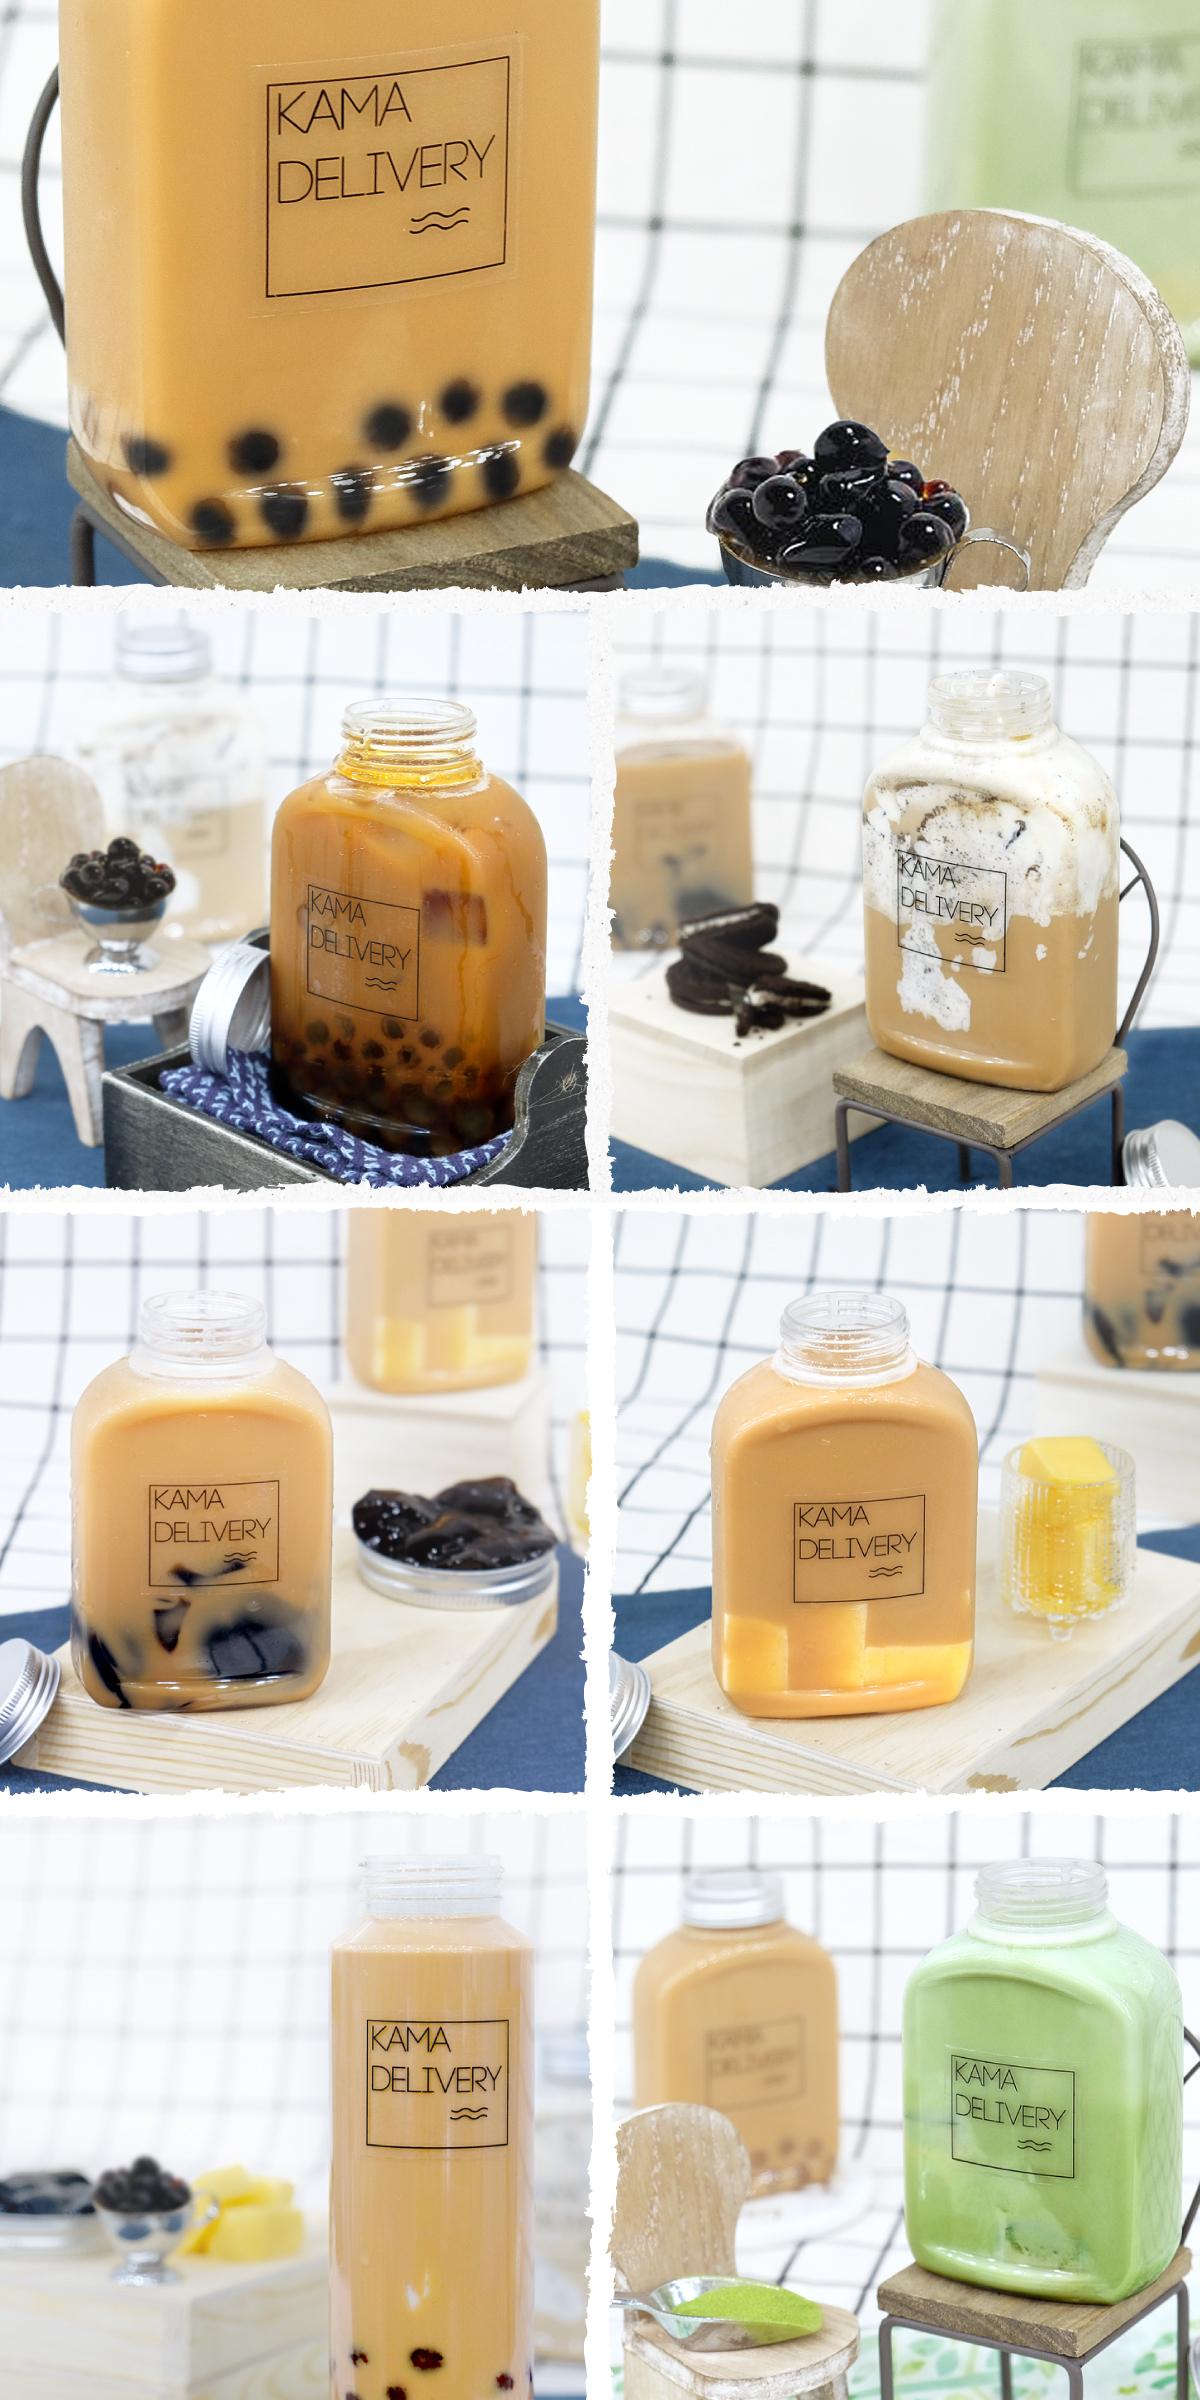 Kamadelivery推出的奶茶到會飲品系列